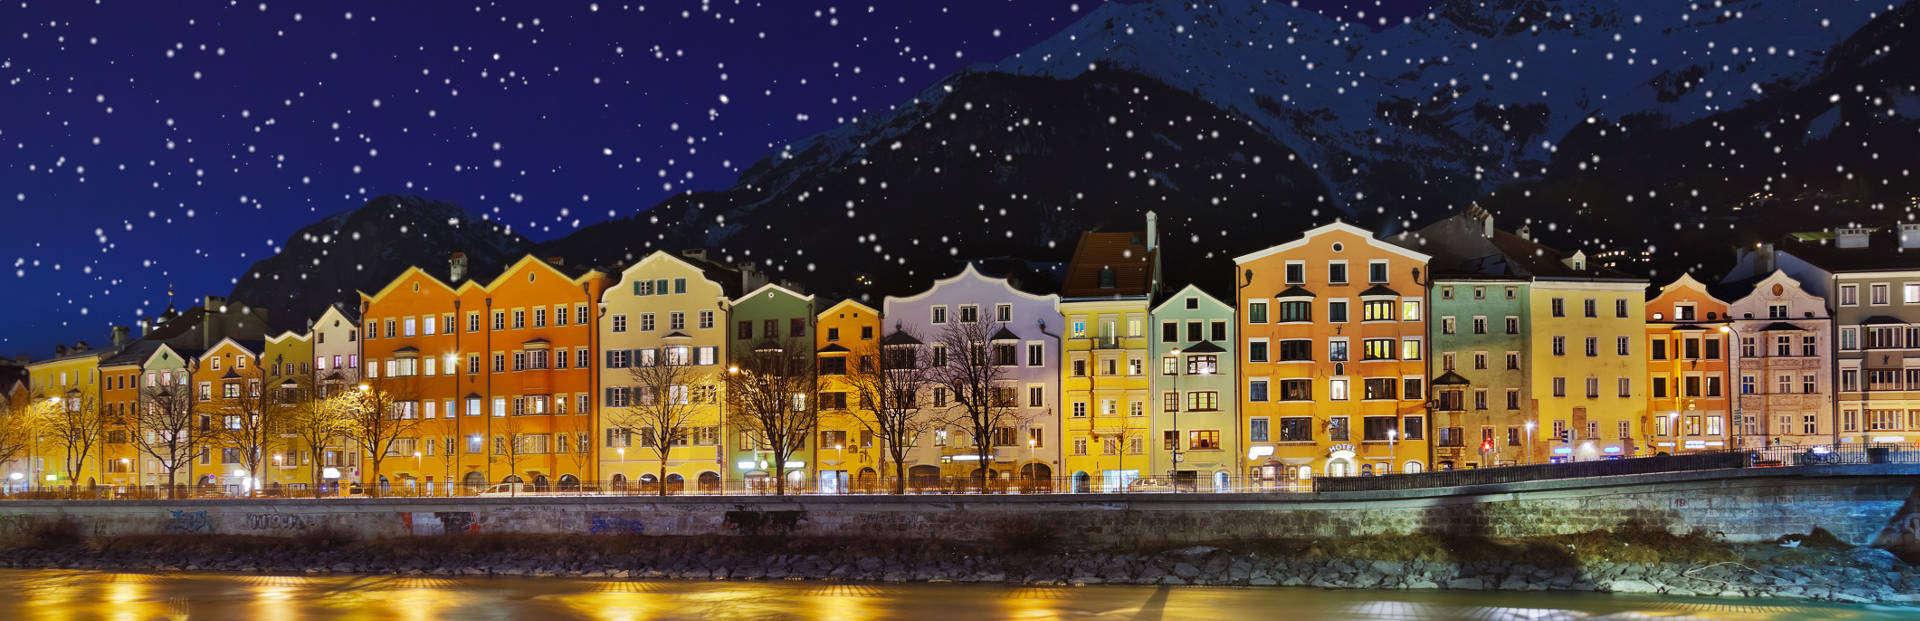 winter_instbruck